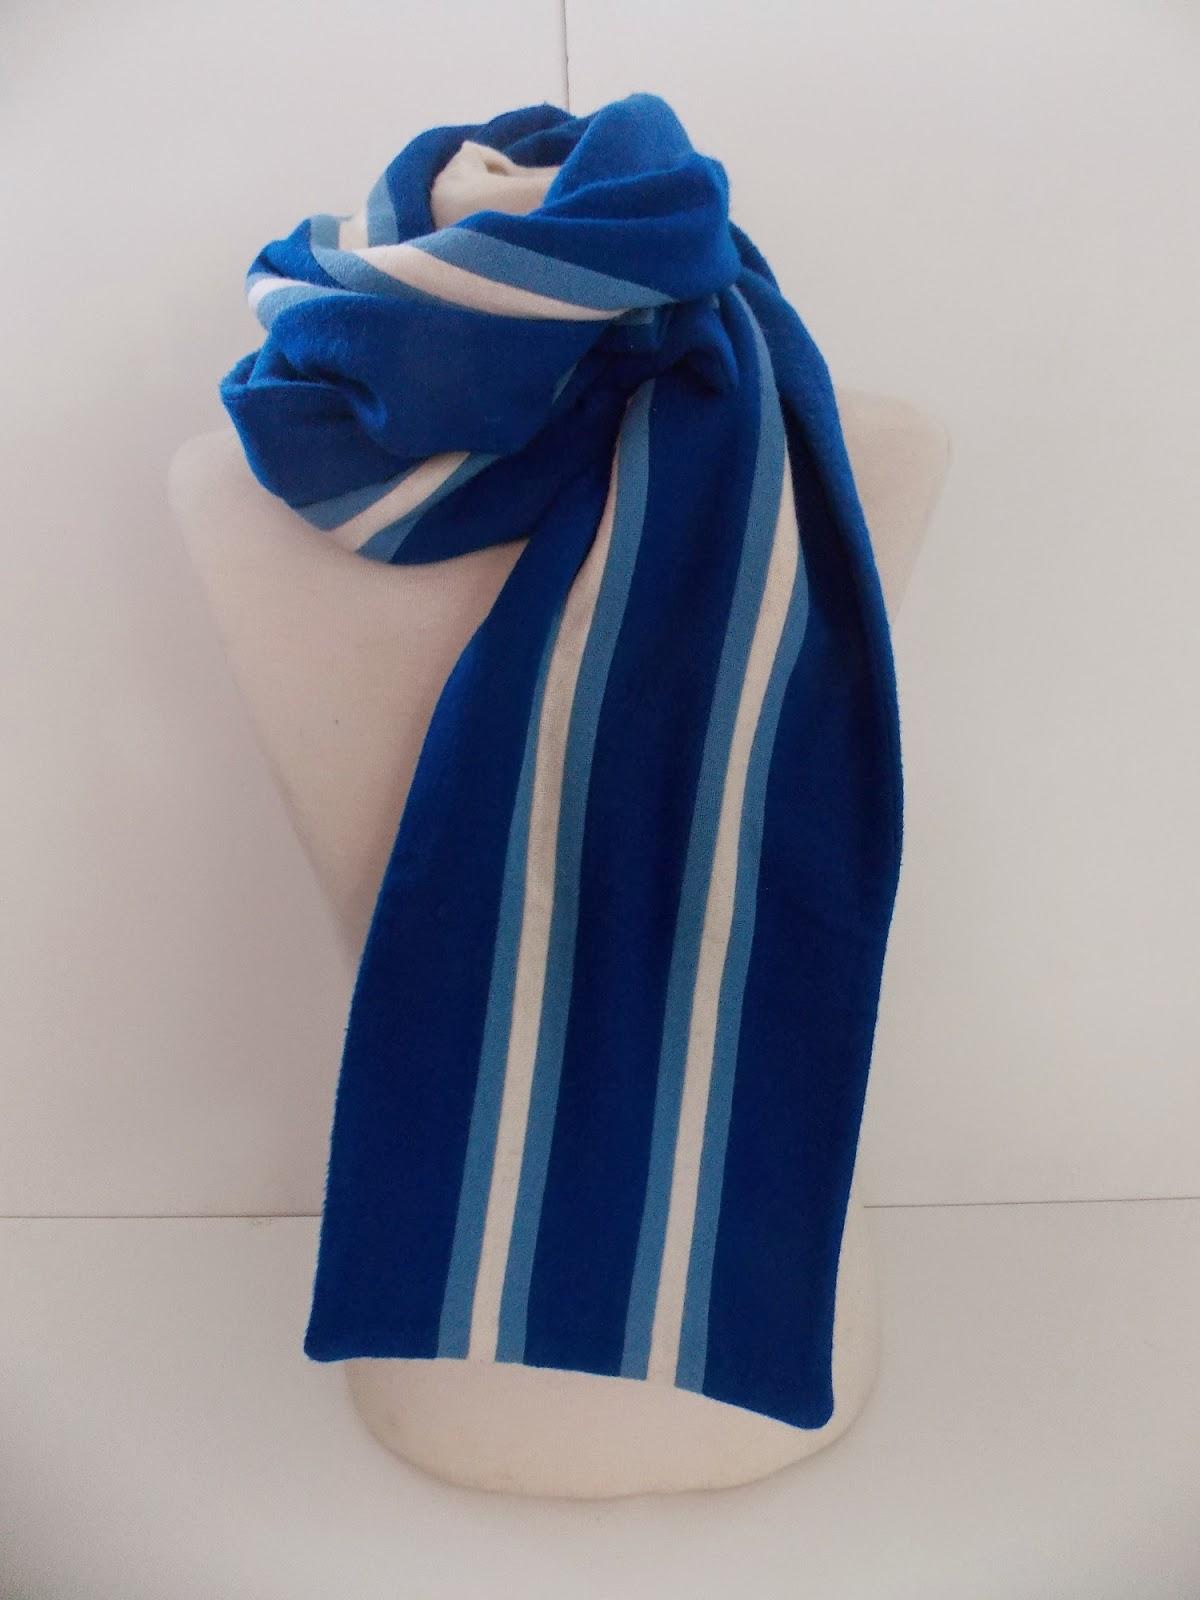 gama clothing presents cambridge scarf